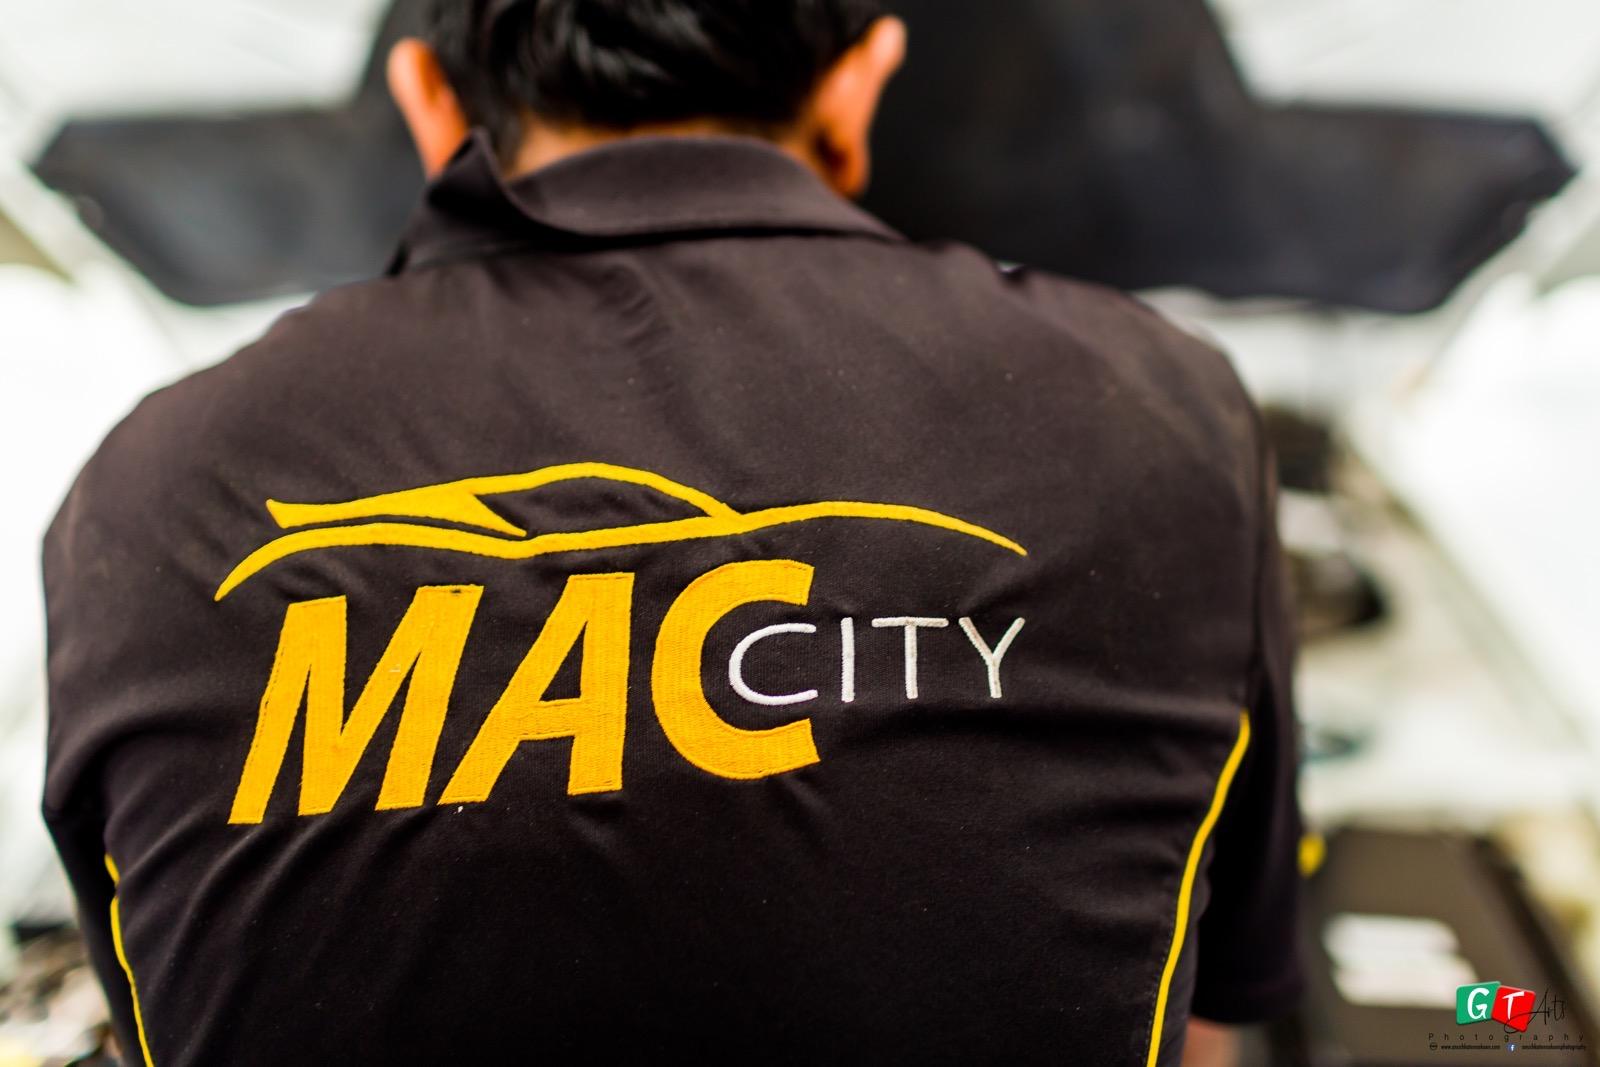 Mac City staff working on a car repair